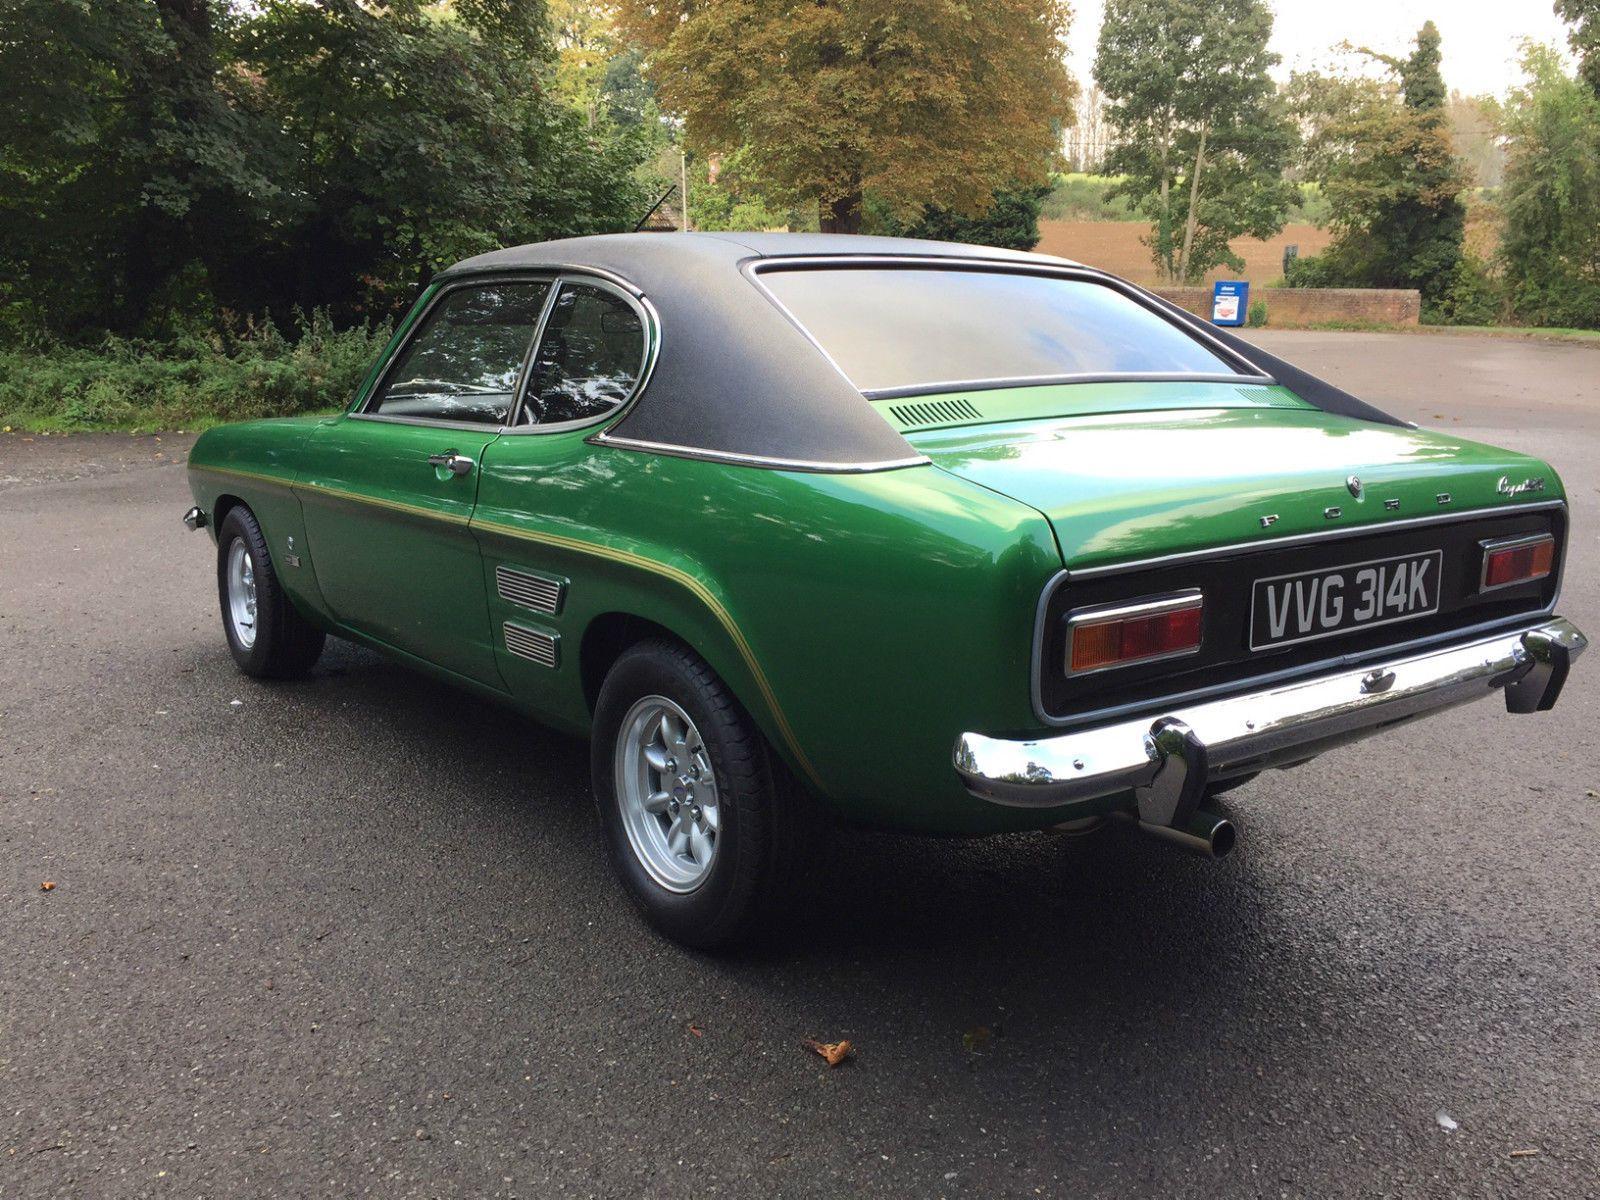 http://www.ebay.co.uk/itm/1972-Ford-Capri-Mk1-1600GT-SVO-Best-in-the ...